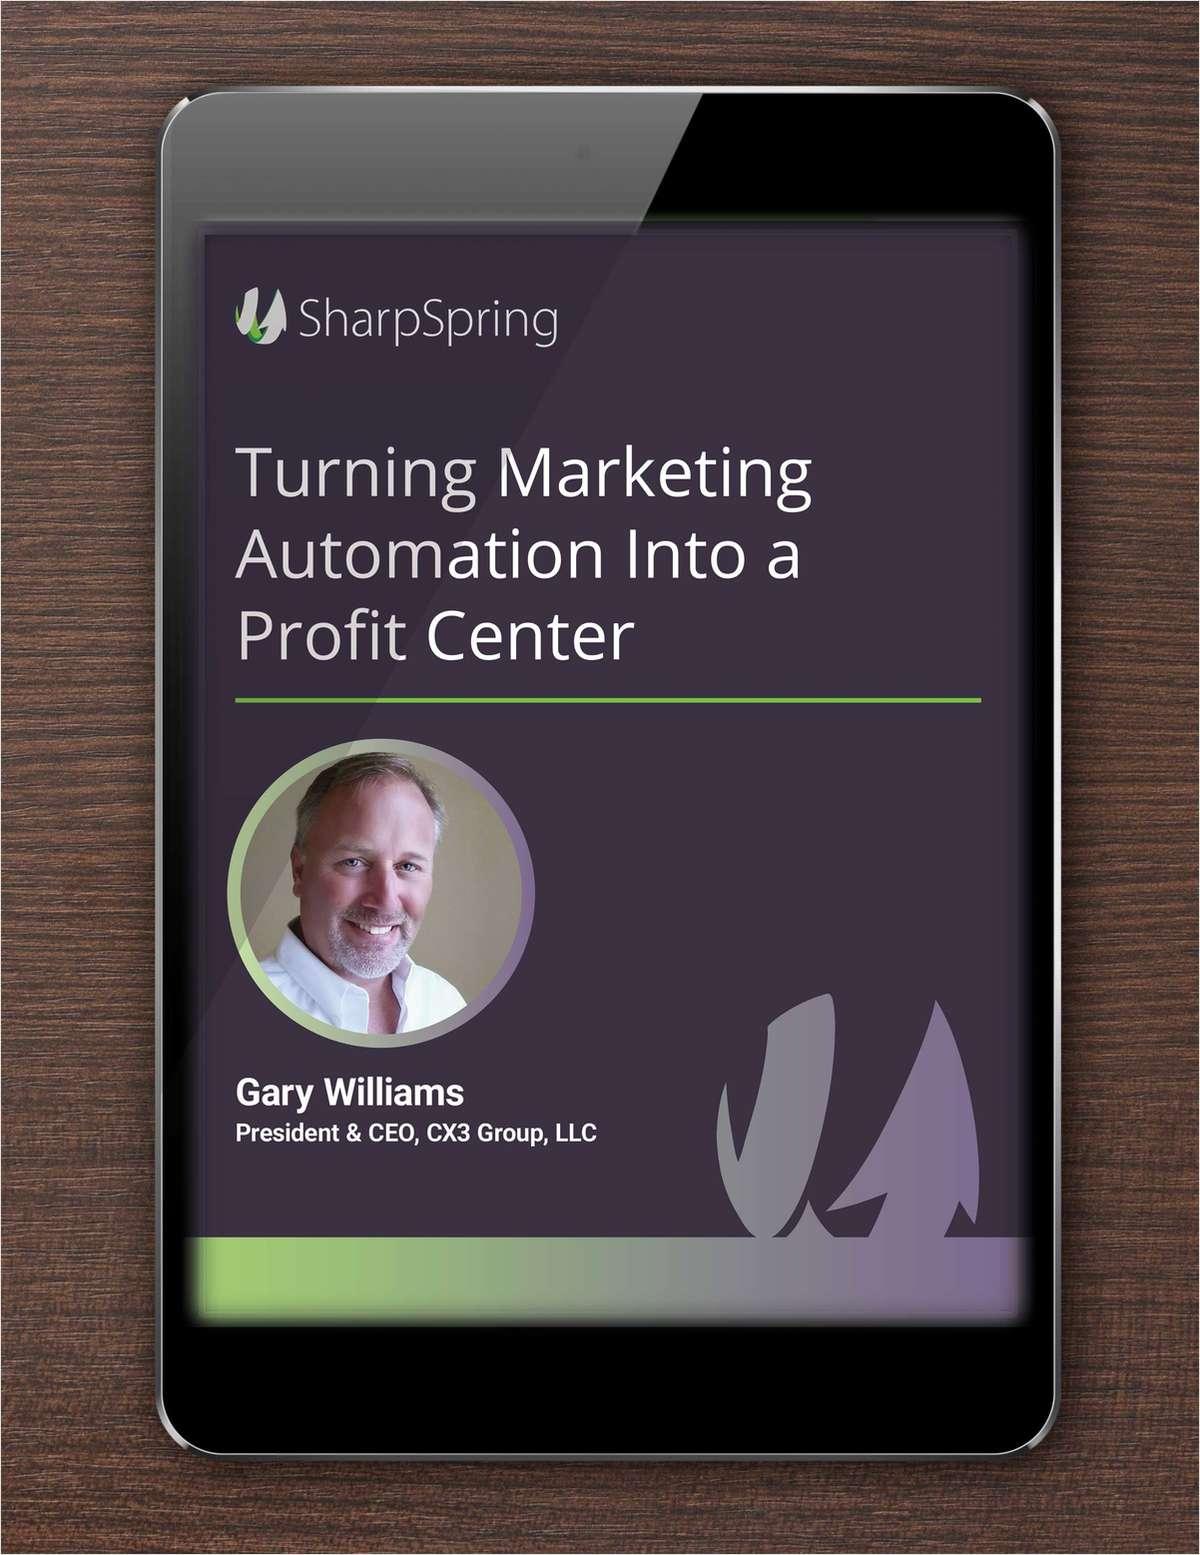 Making Marketing Automation a Profit Center